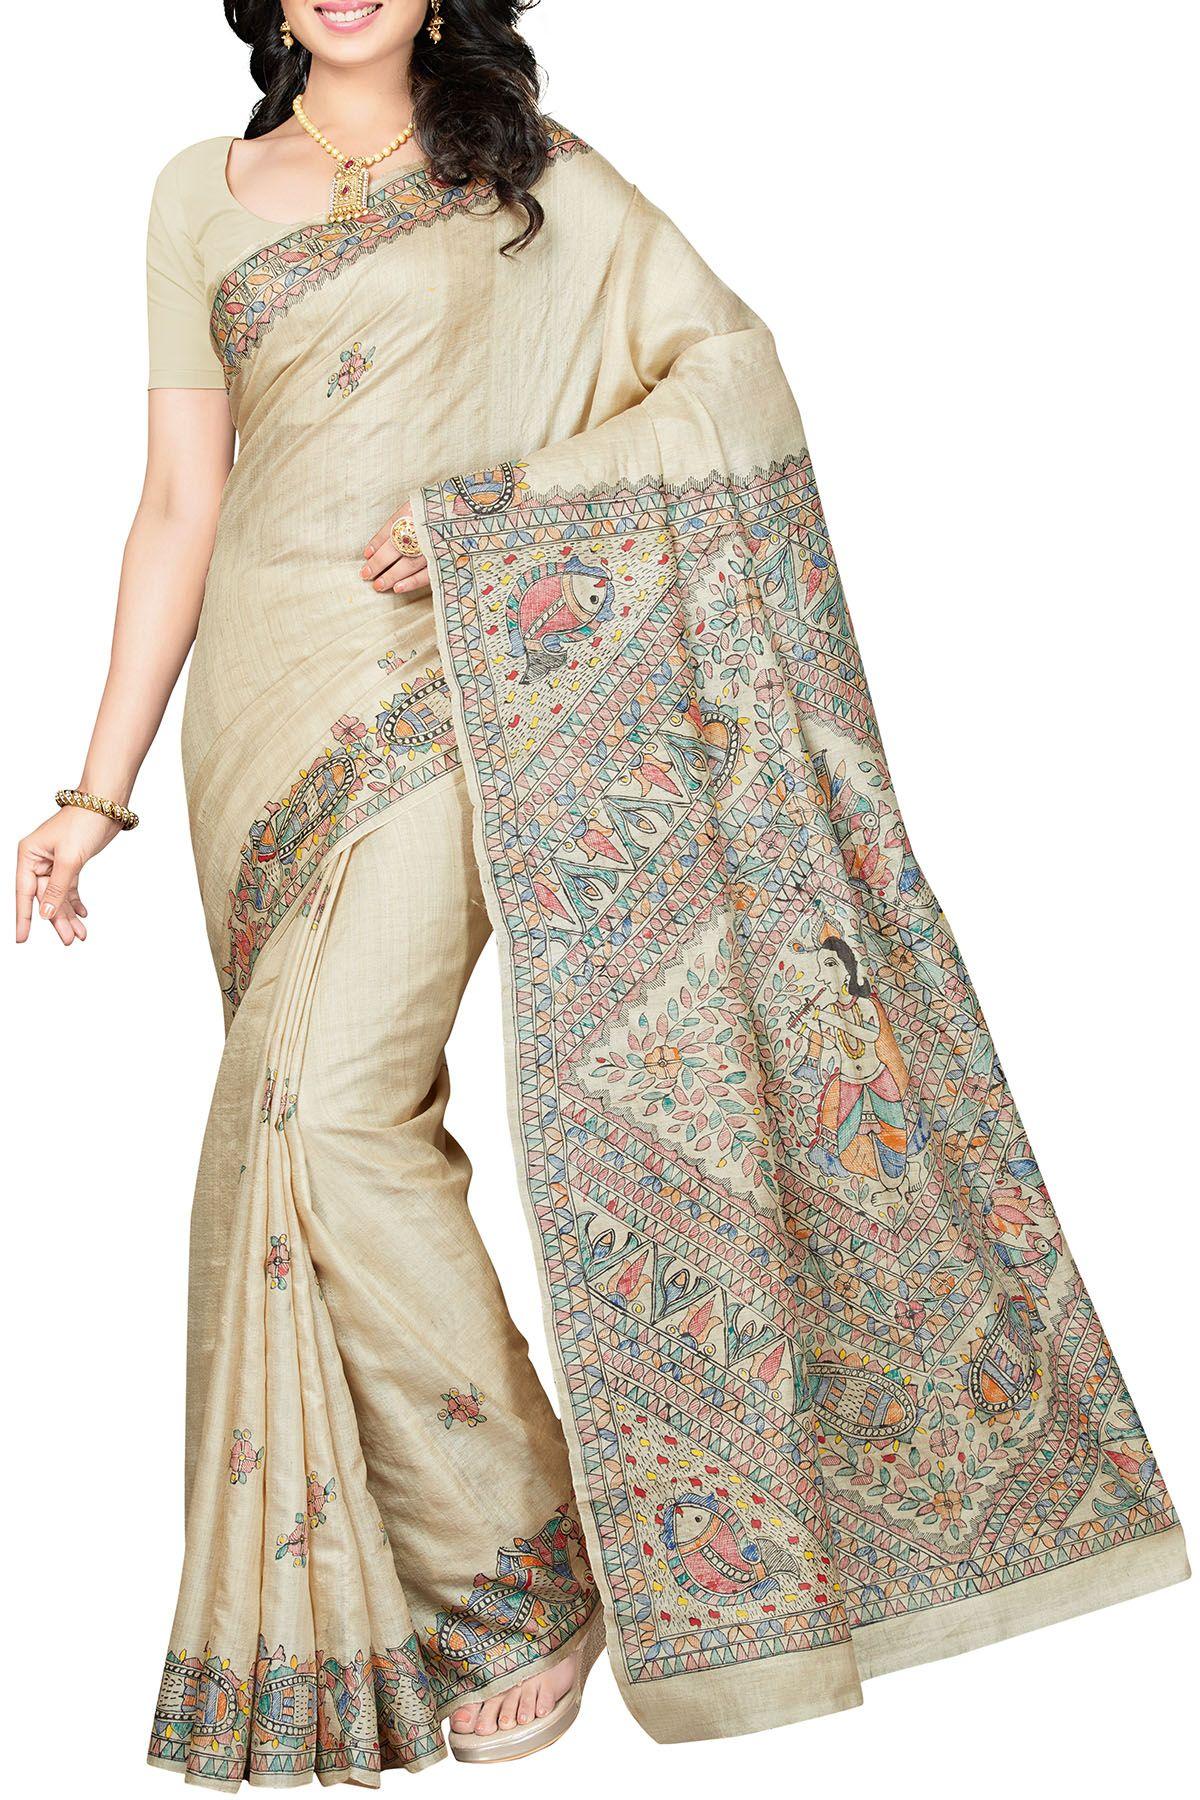 Off white tussar silk saree pin by ethnickart on madhubani sarees  pinterest  silk sarees